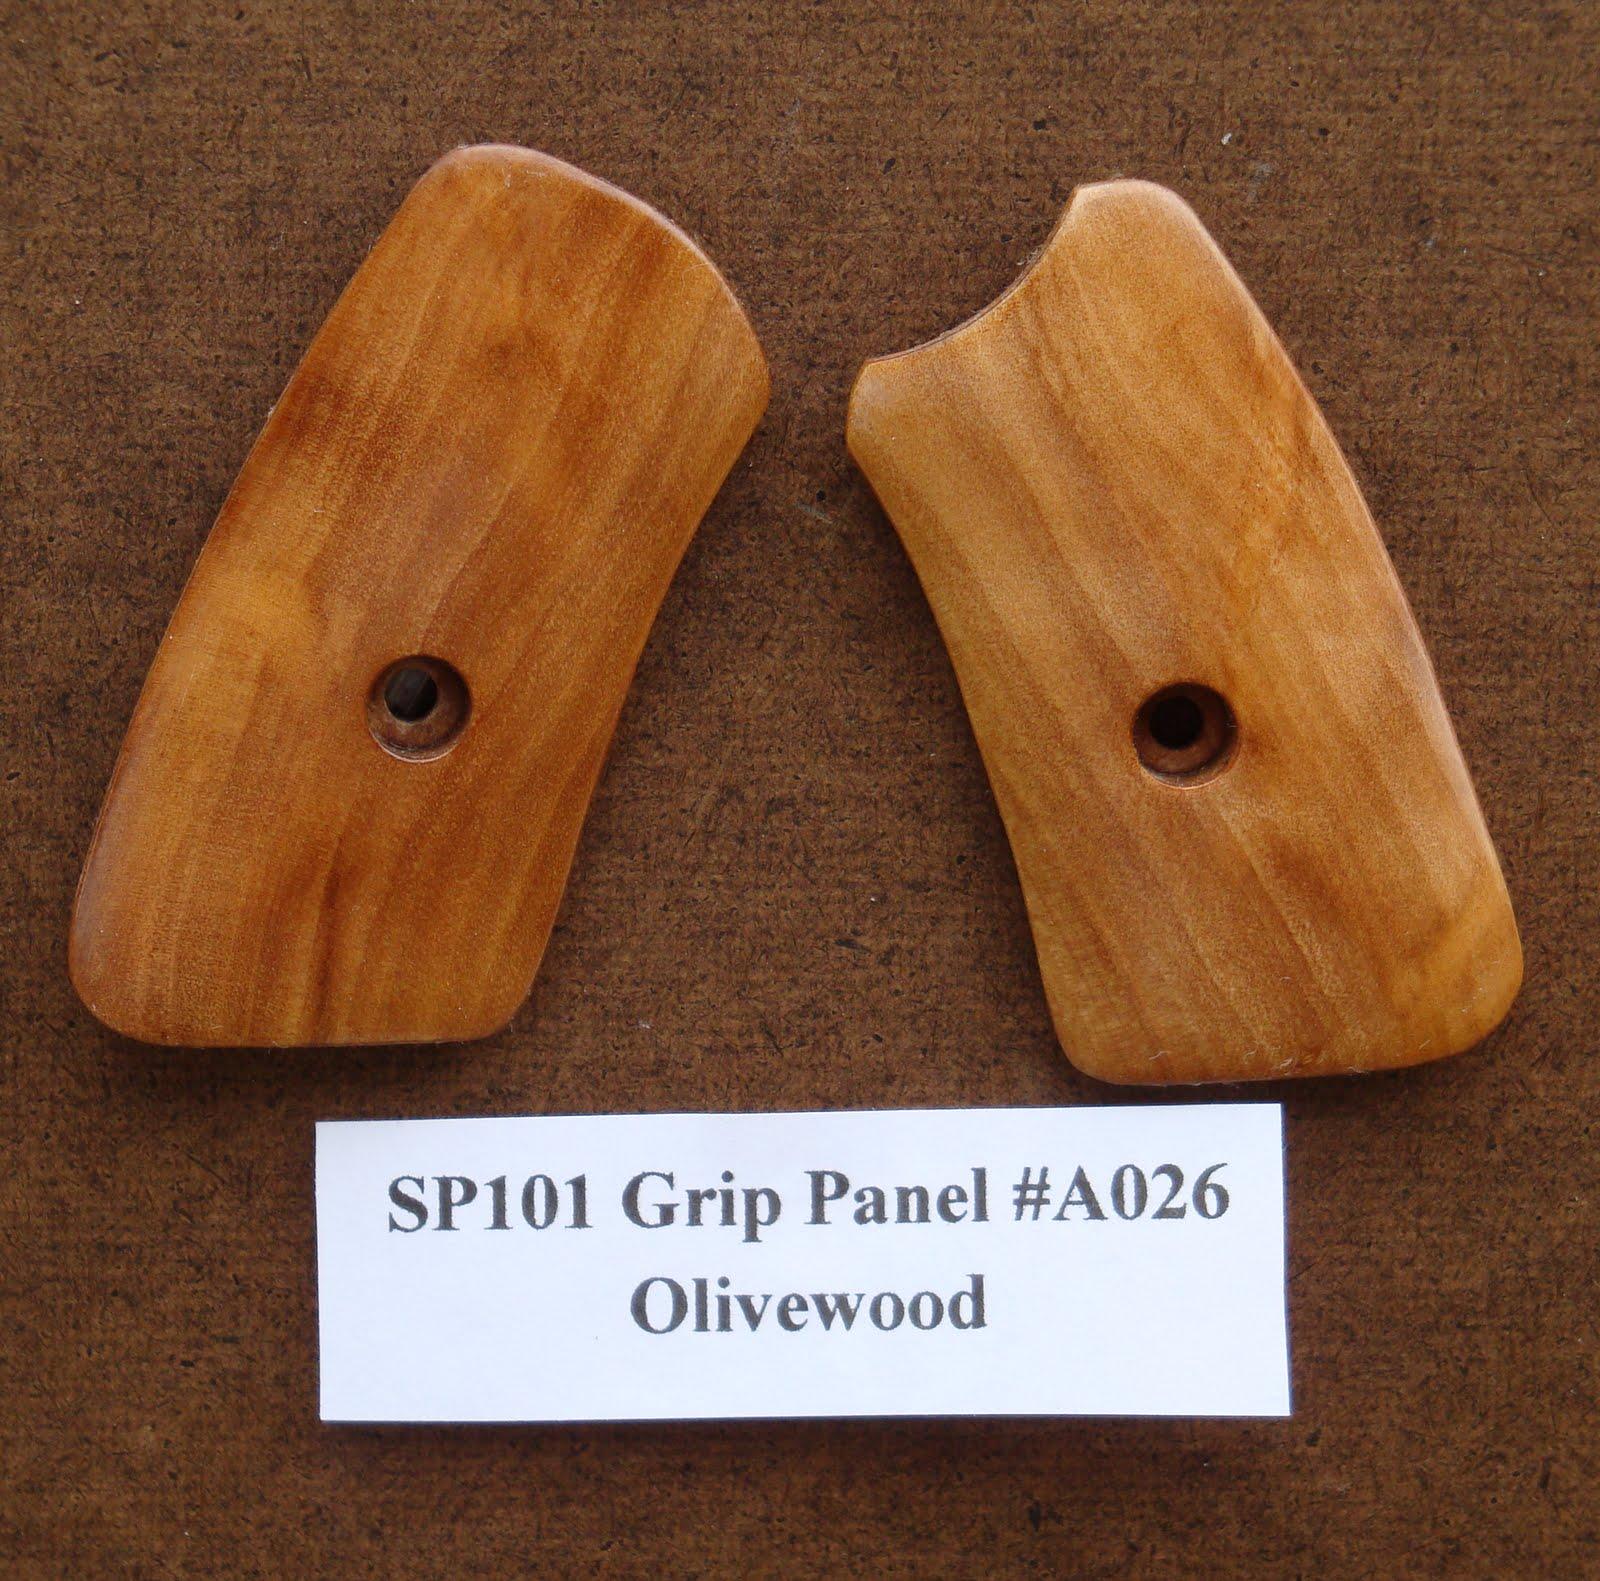 Gp100 Roper Grips